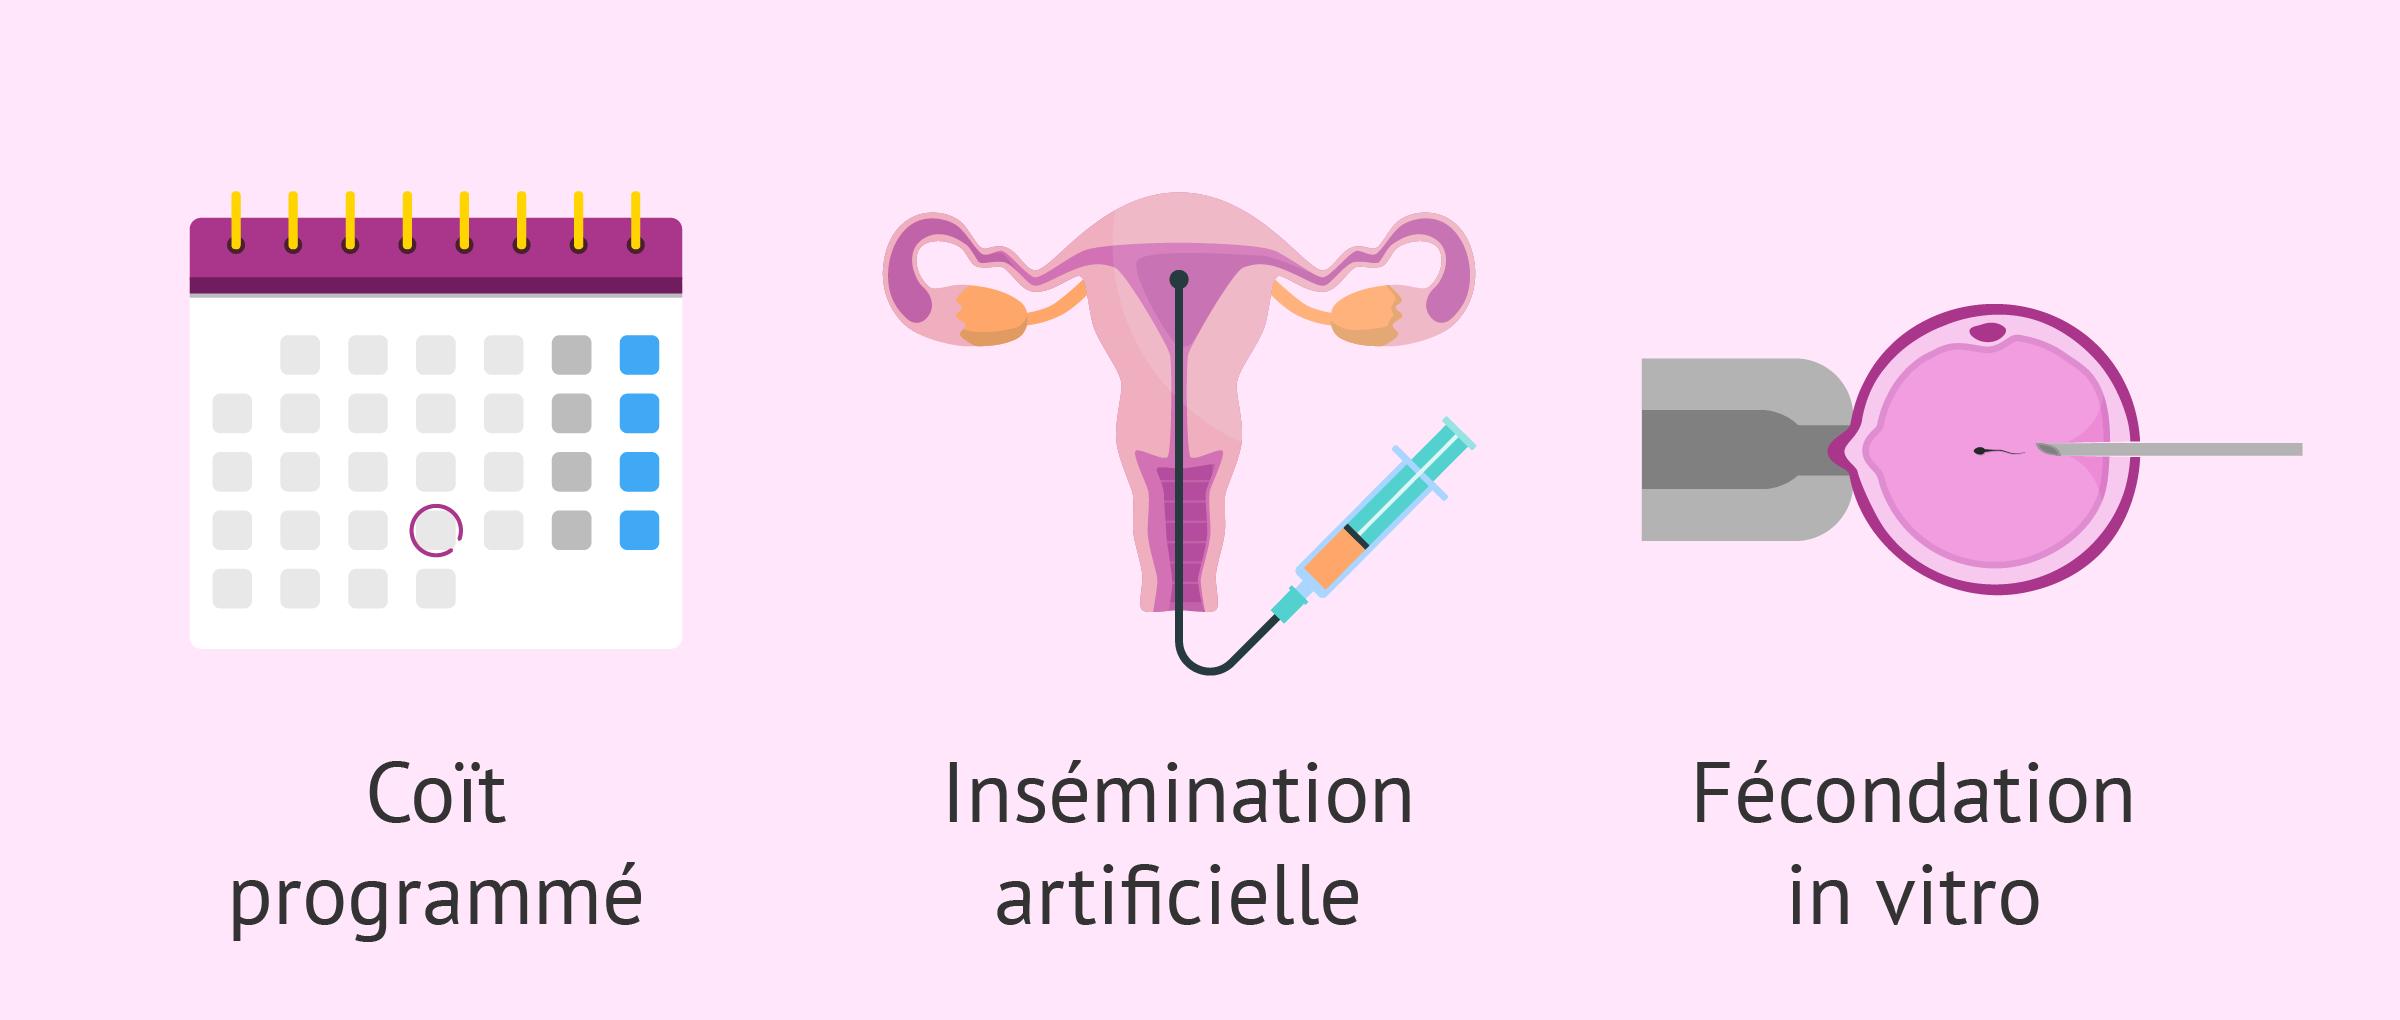 Imagen: Traitement infertilité femme